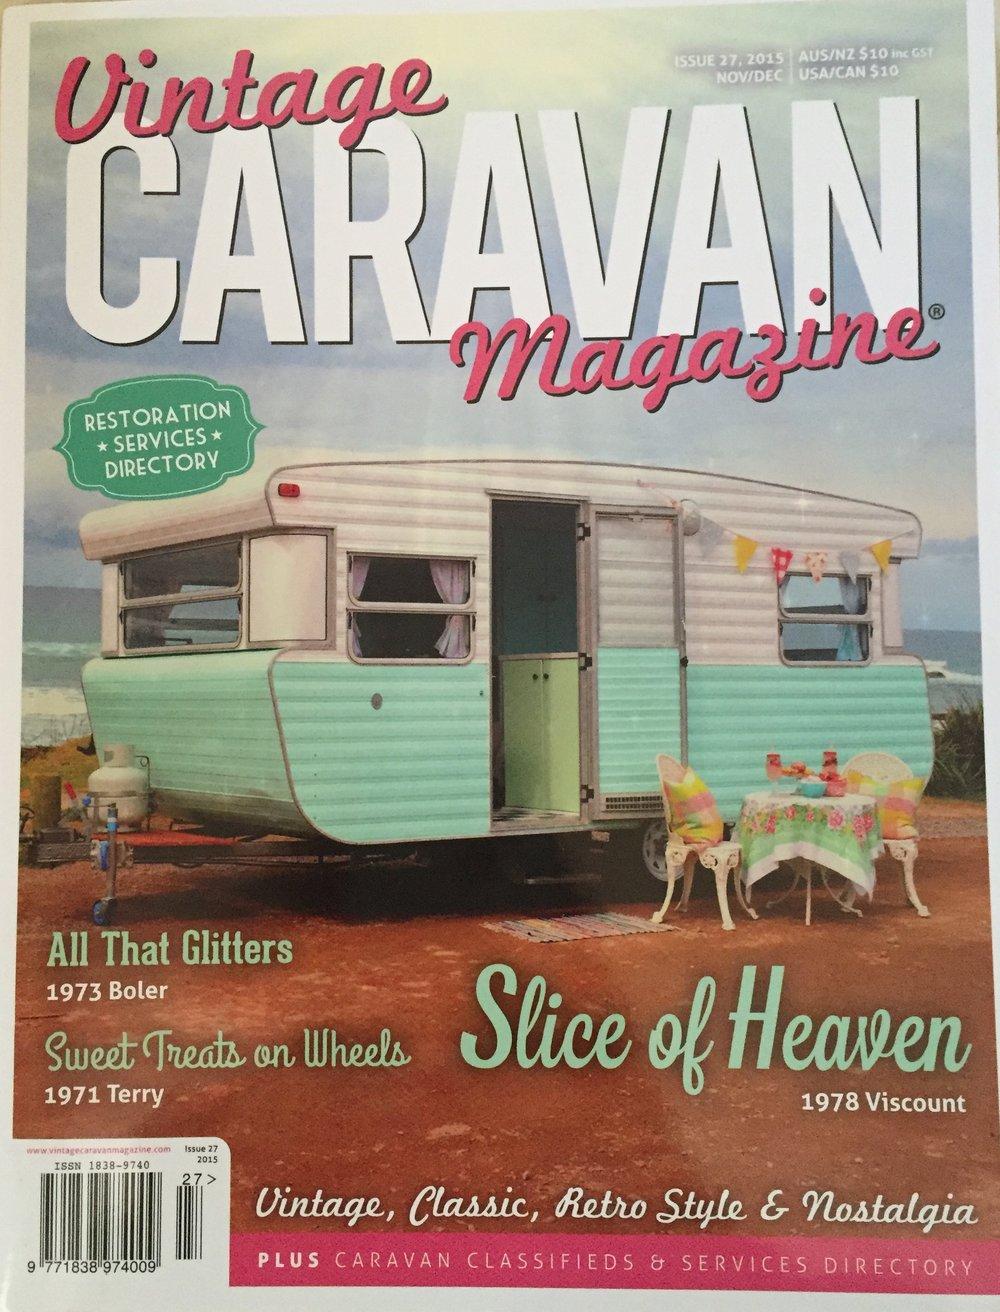 vintagecaravanmagazine.jpg